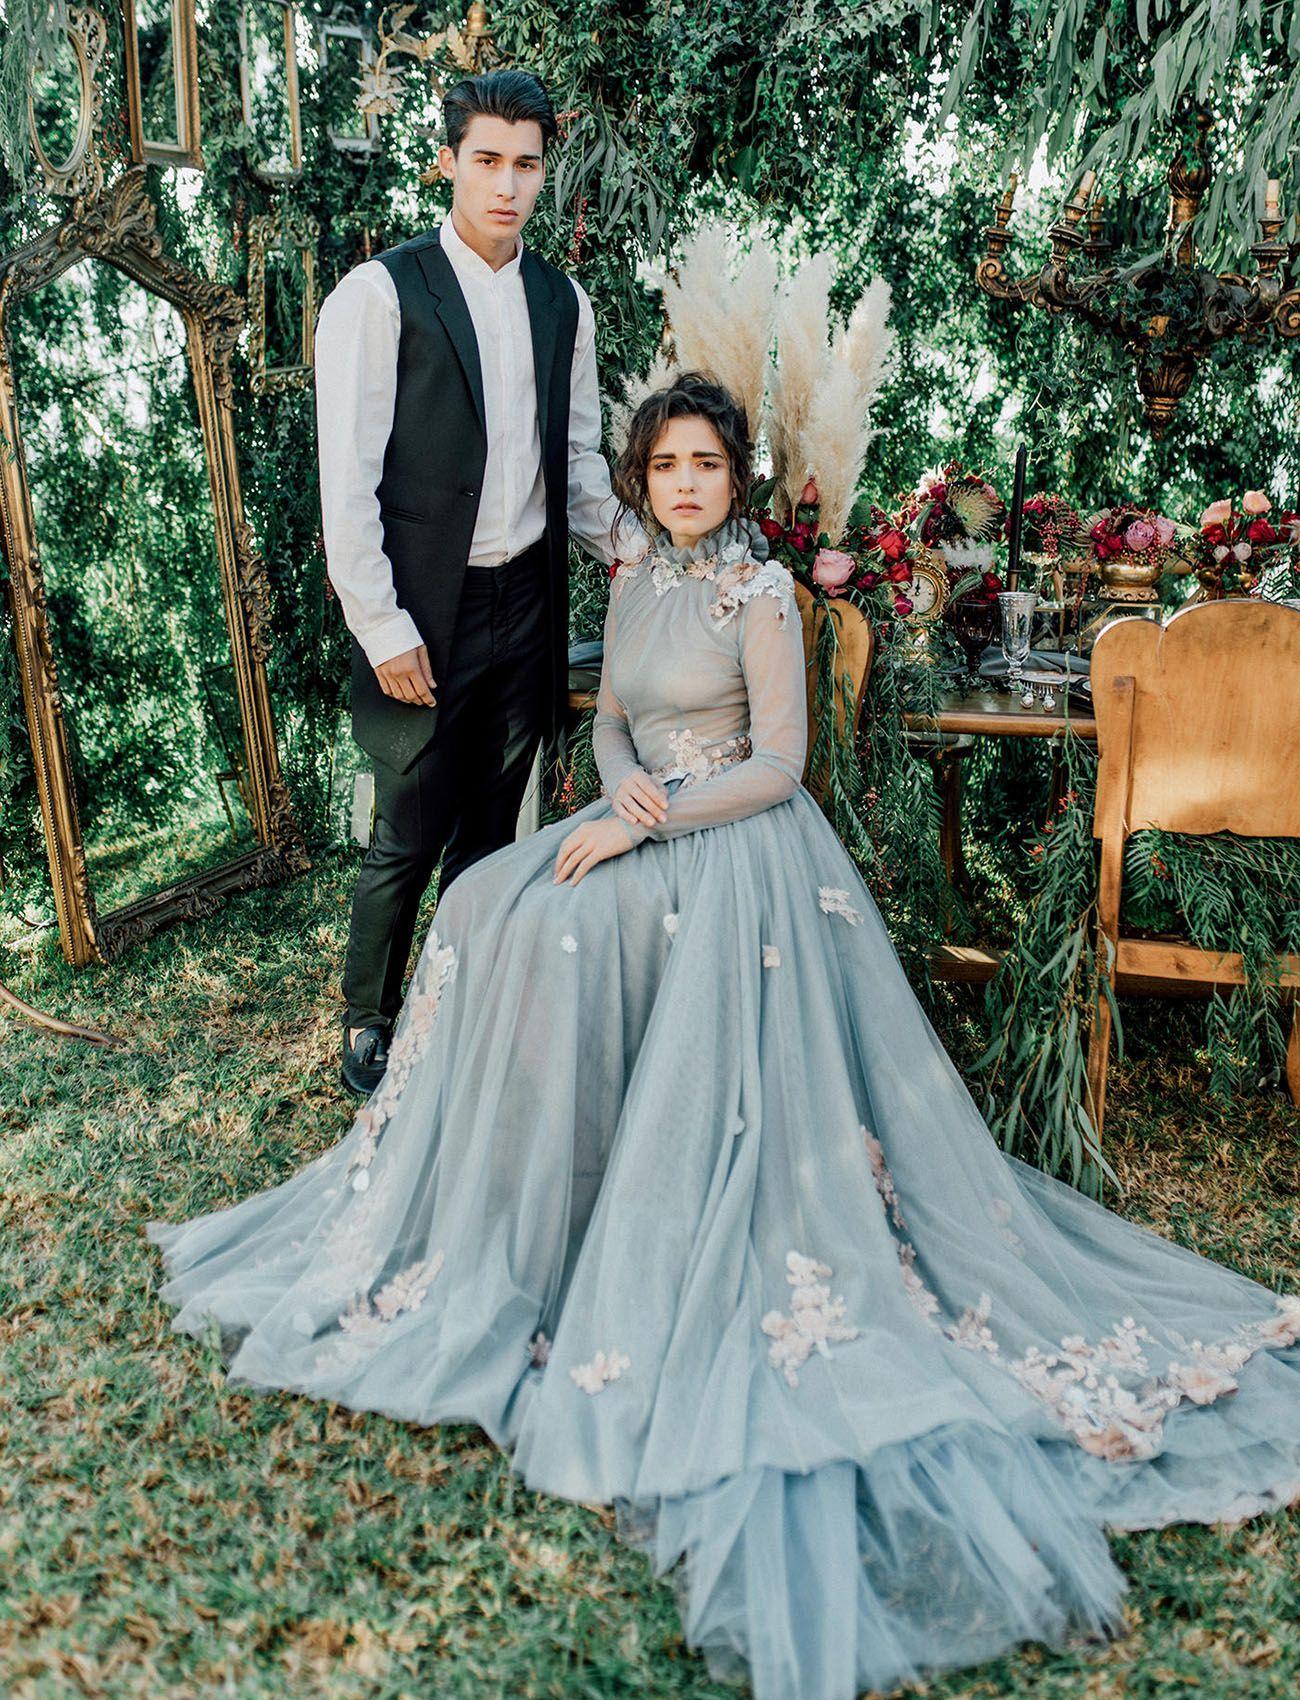 Secret Garden Wedding Inspiration With a Flower-Studded Dusty Blue ...